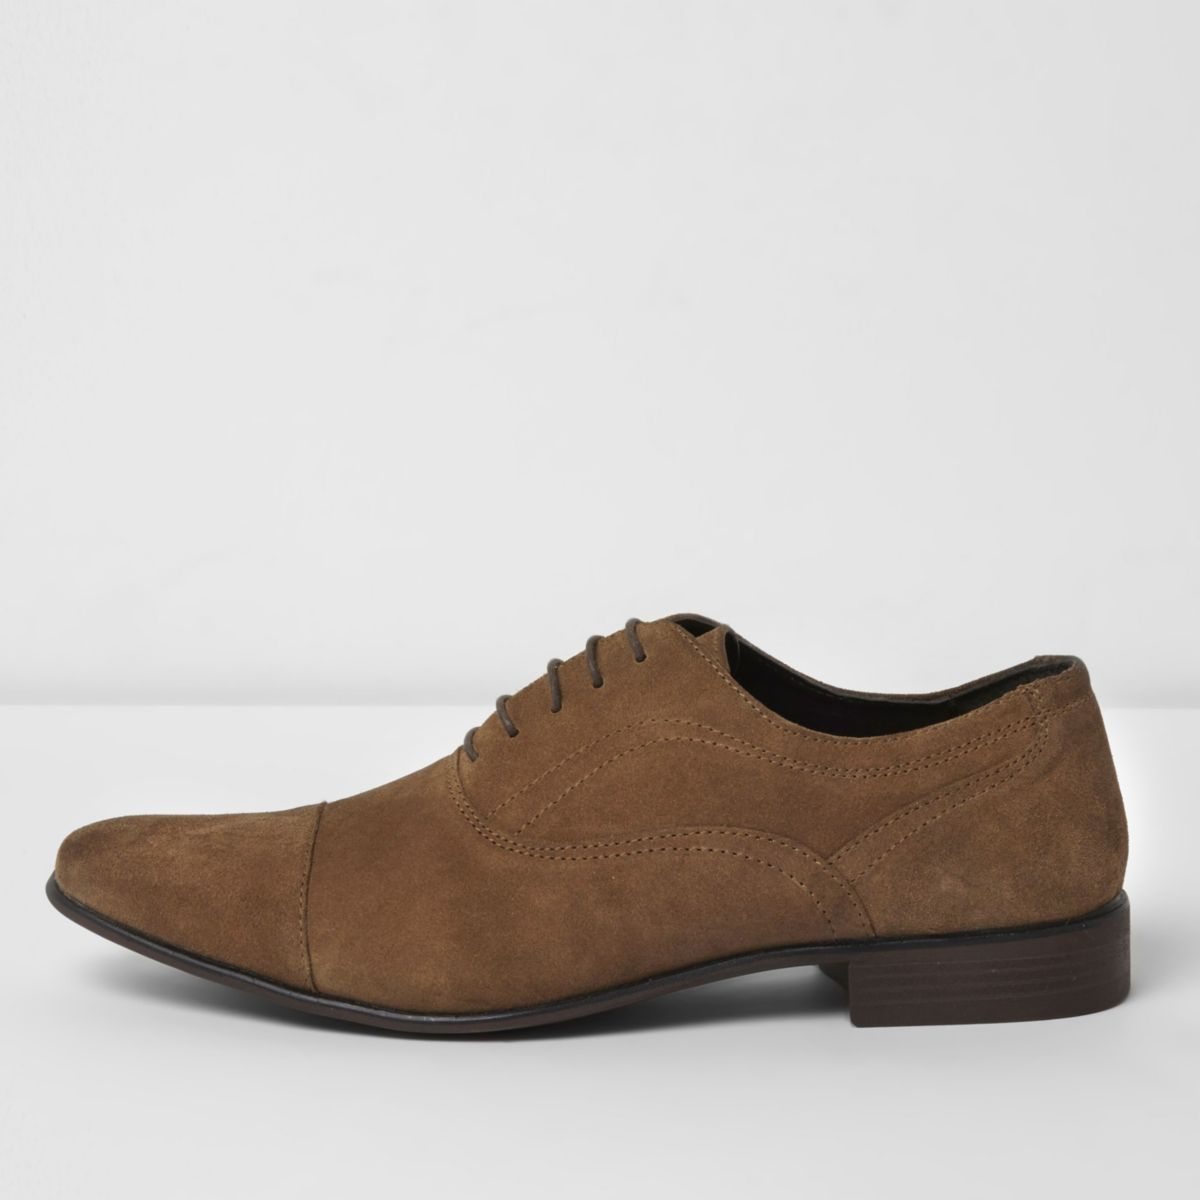 Tan suede toecap oxford shoes